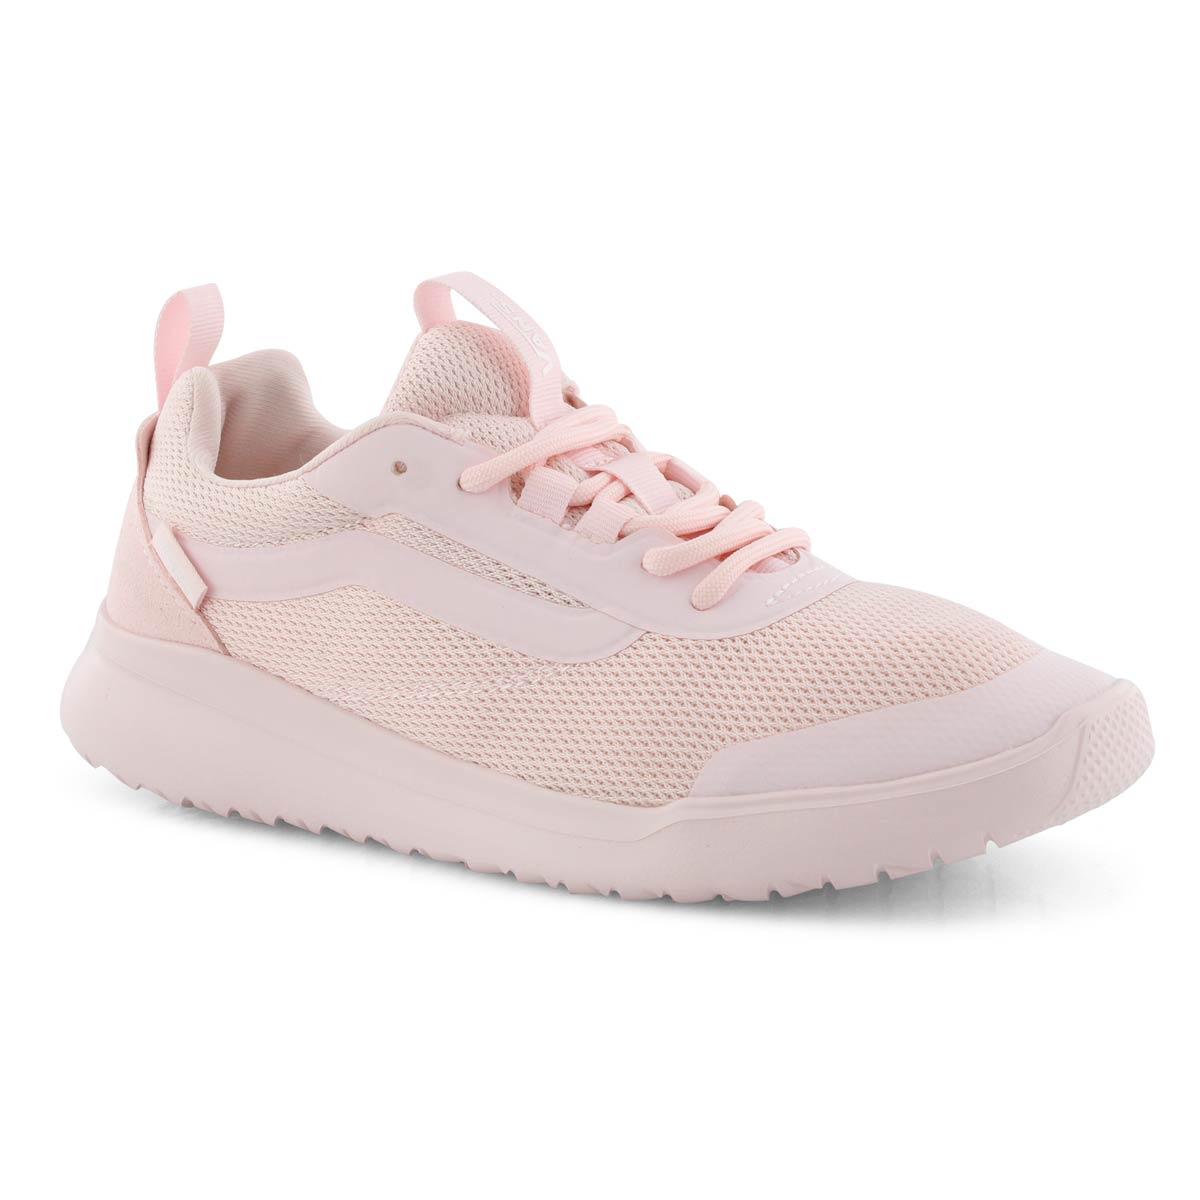 ecd1b4e2eb6220 Vans Women s CERUS RW heavenly pink lace up s